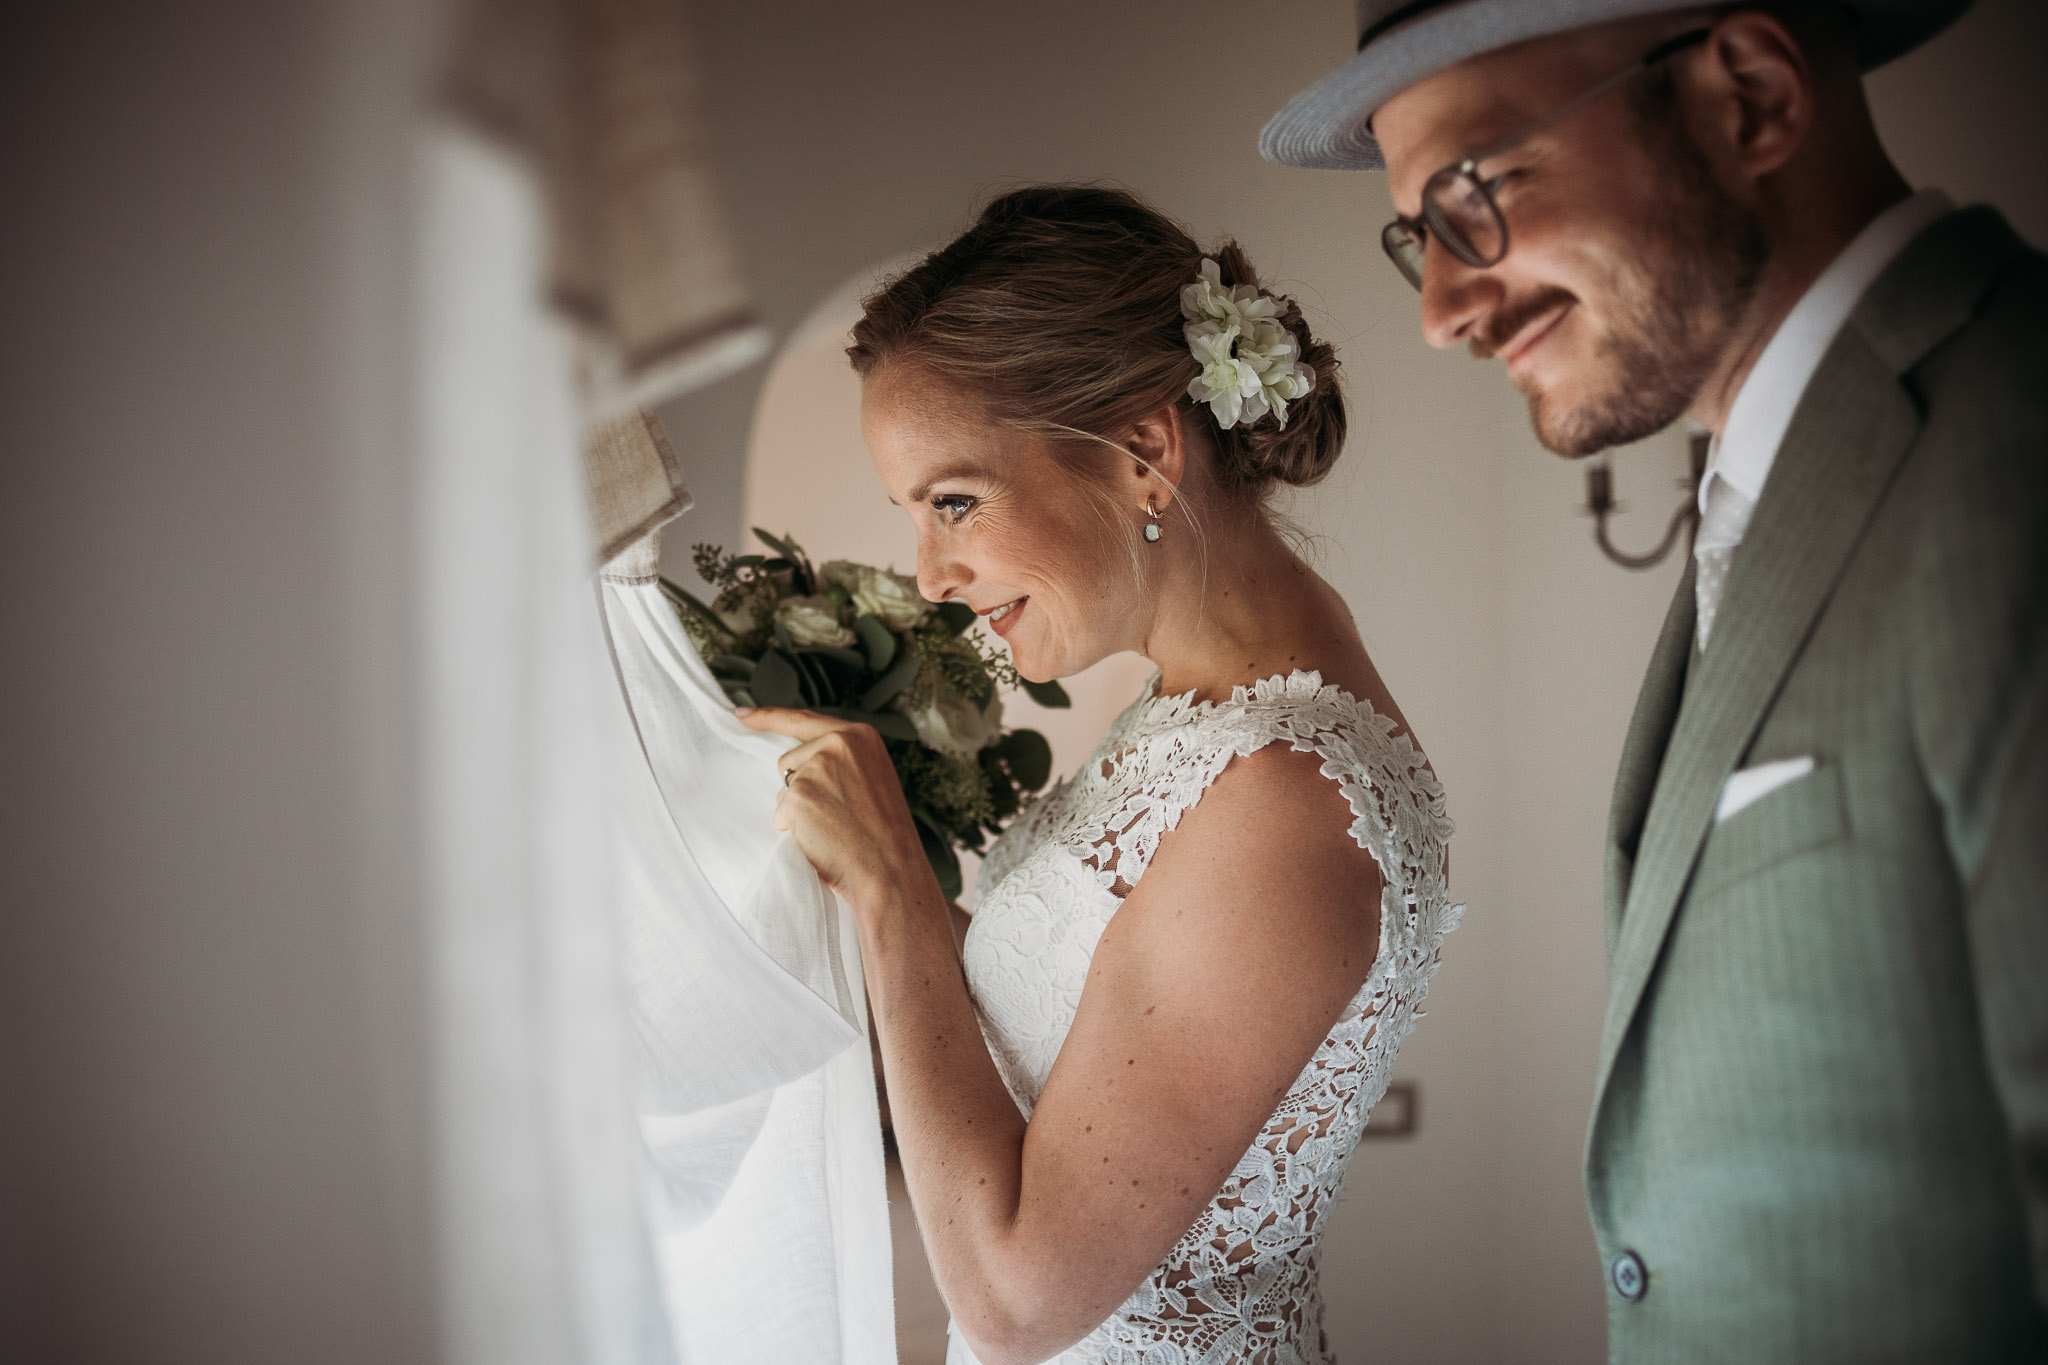 Bride and groom are getting ready for their wedding ceremony at La Villa Hotel, Mombaruzzo